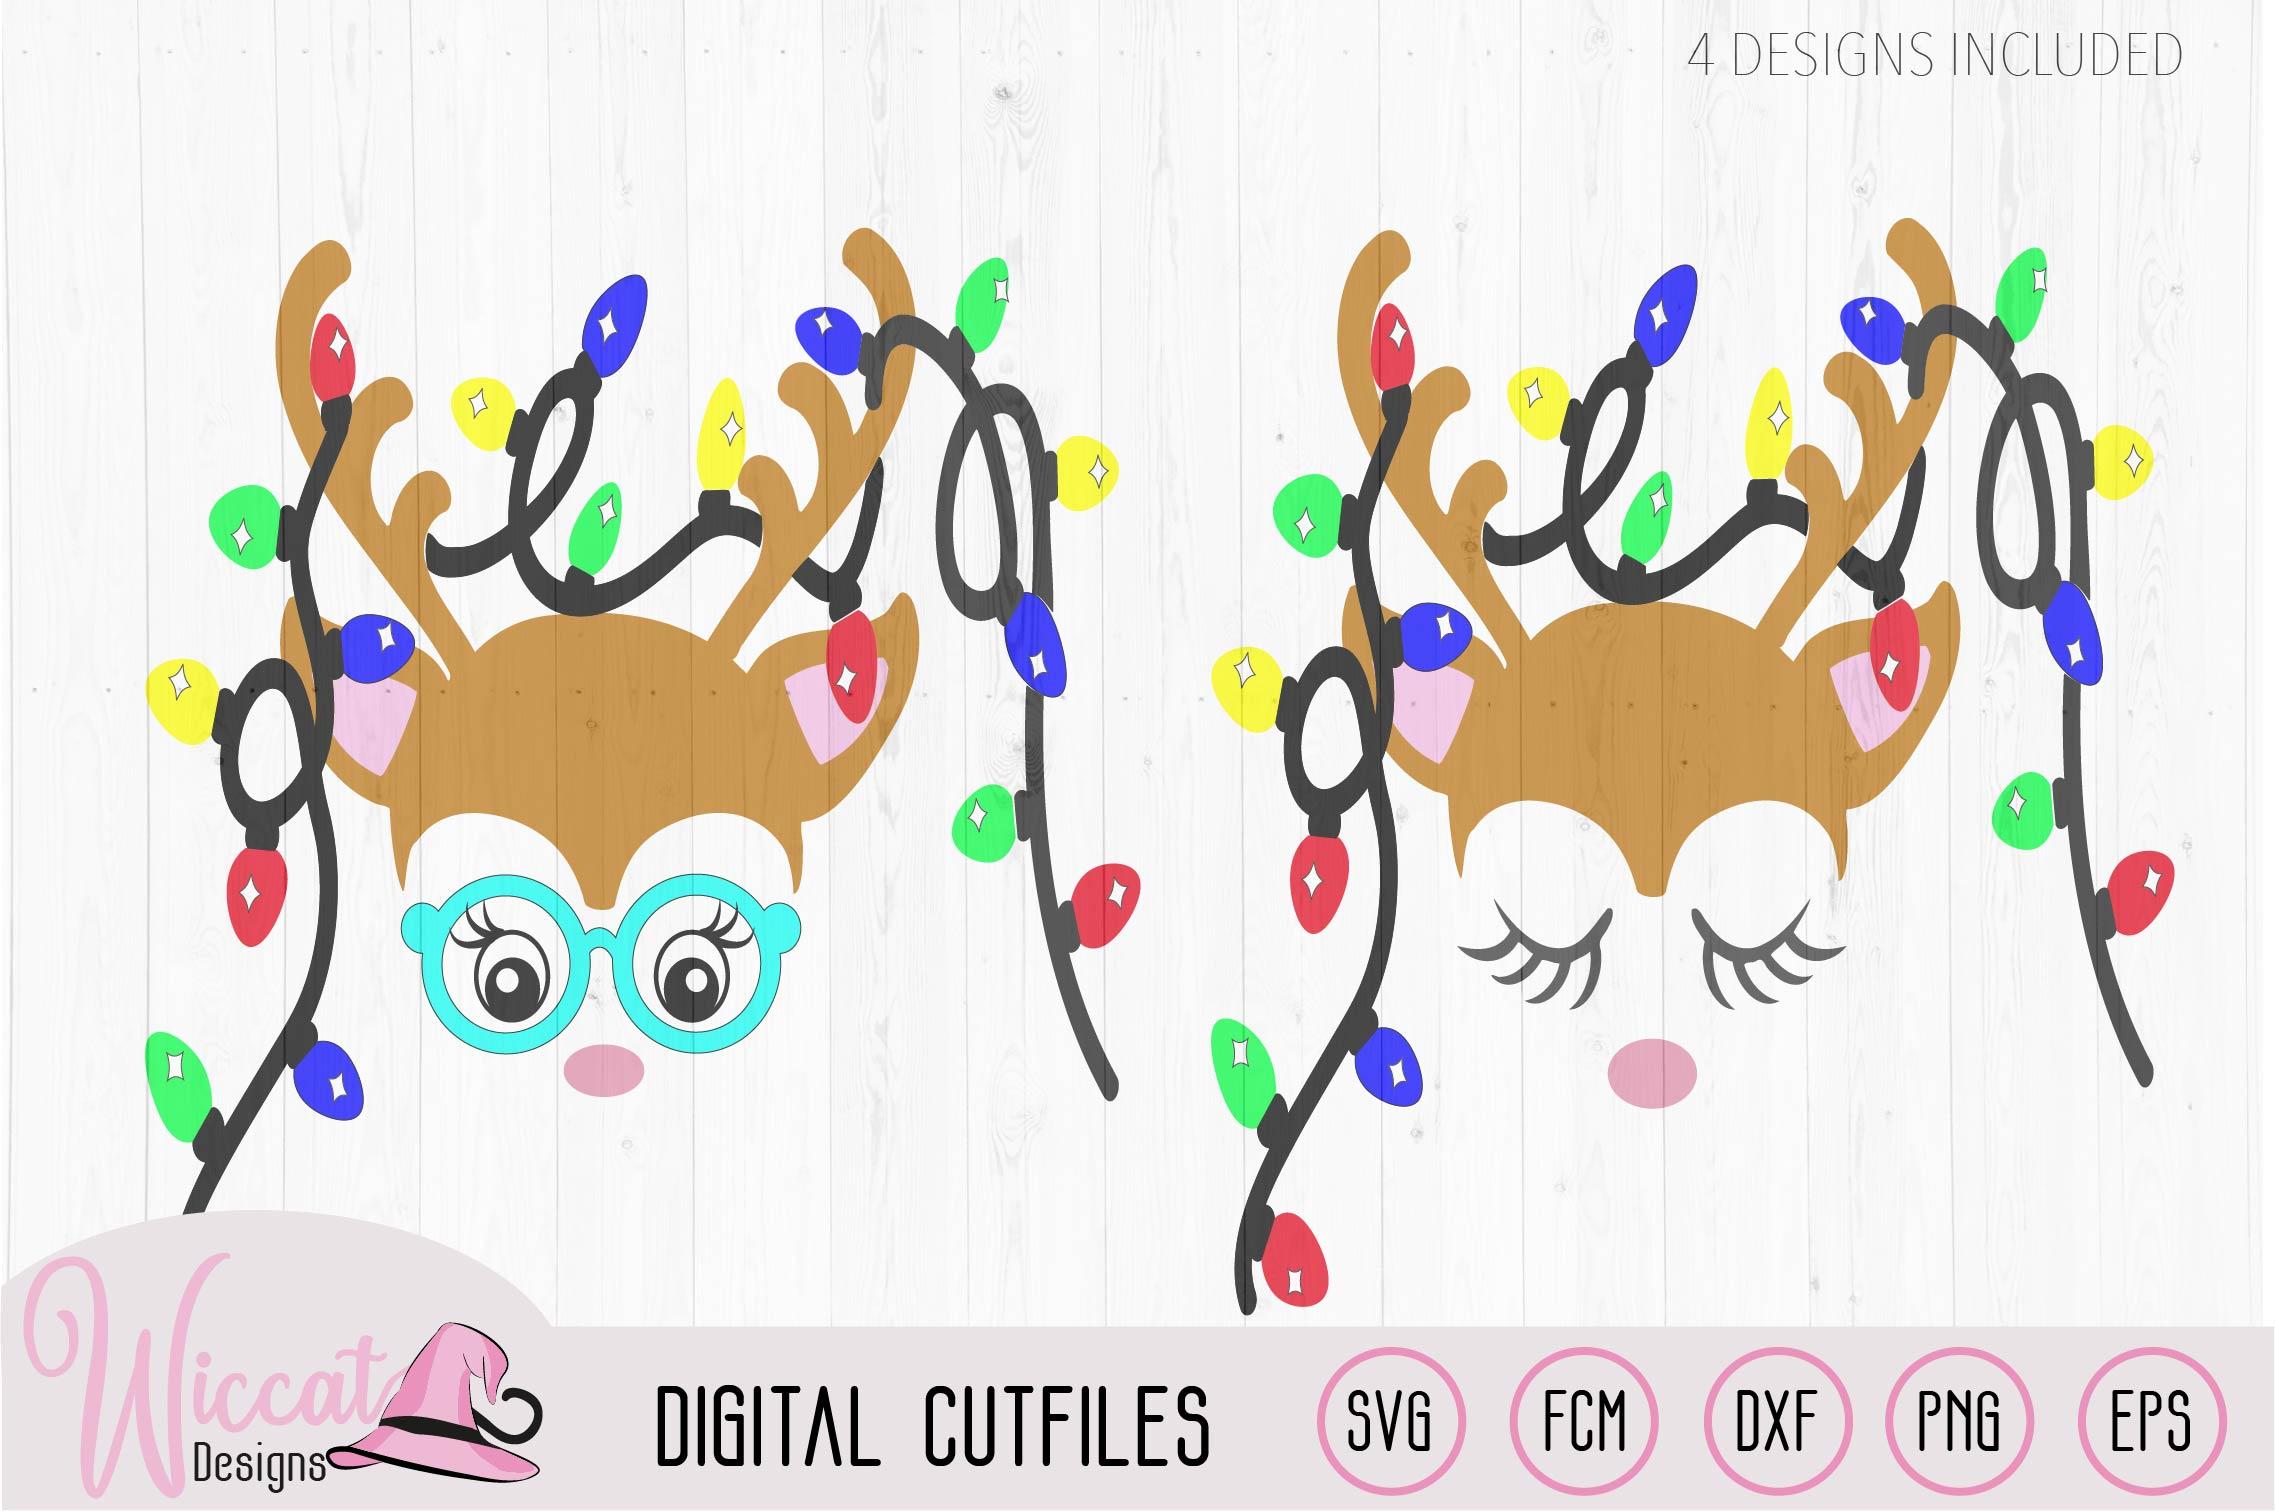 Hipster Reindeer with Christmas lights svg, Baby deer, kids example image 2